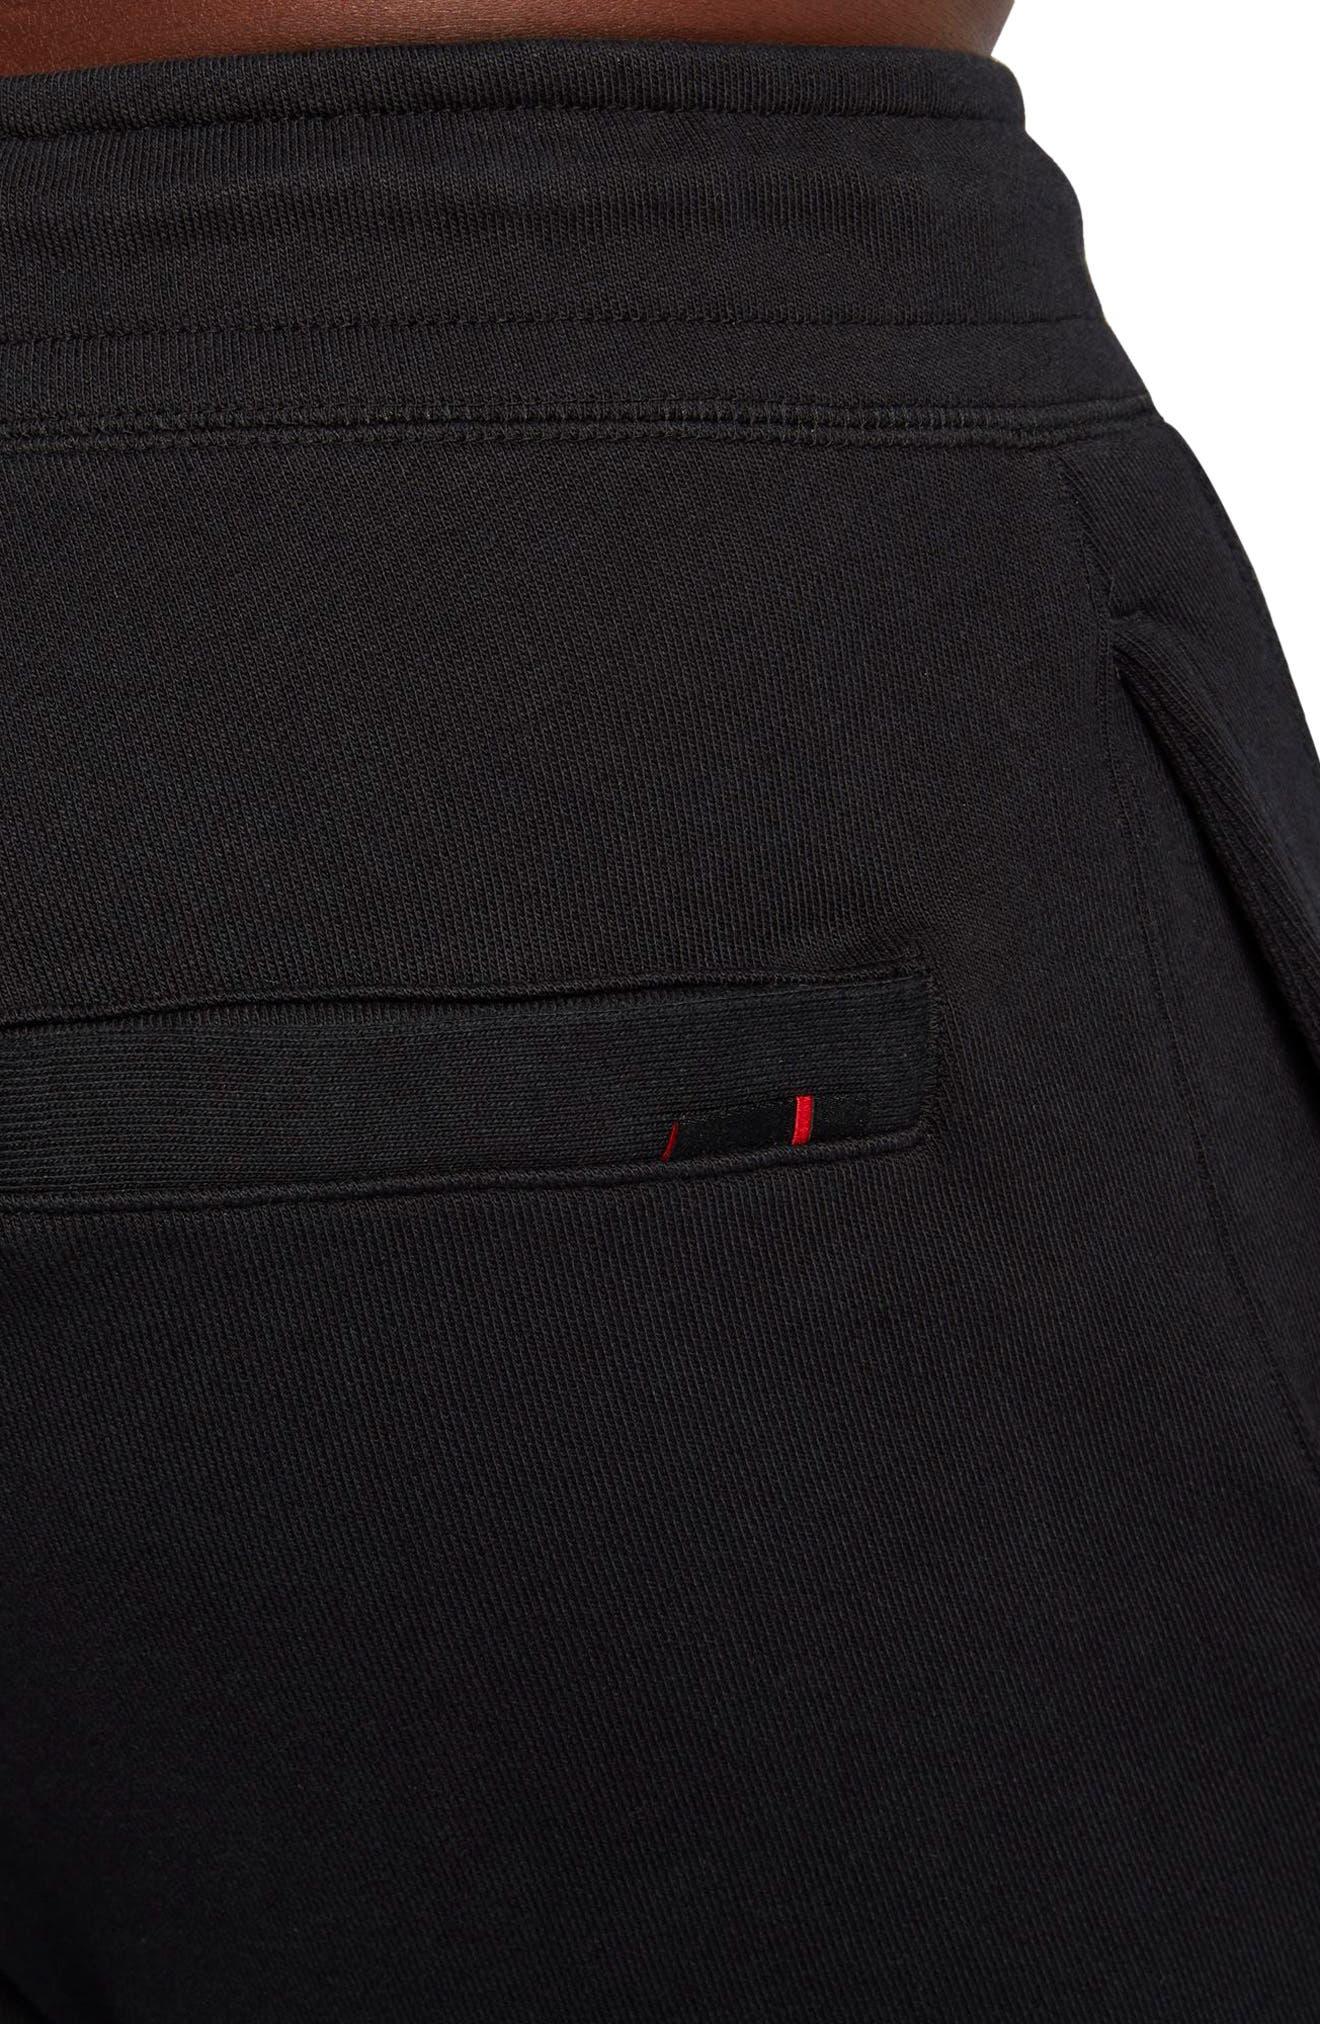 Wings Fleece Pants,                             Alternate thumbnail 4, color,                             Black/ Black